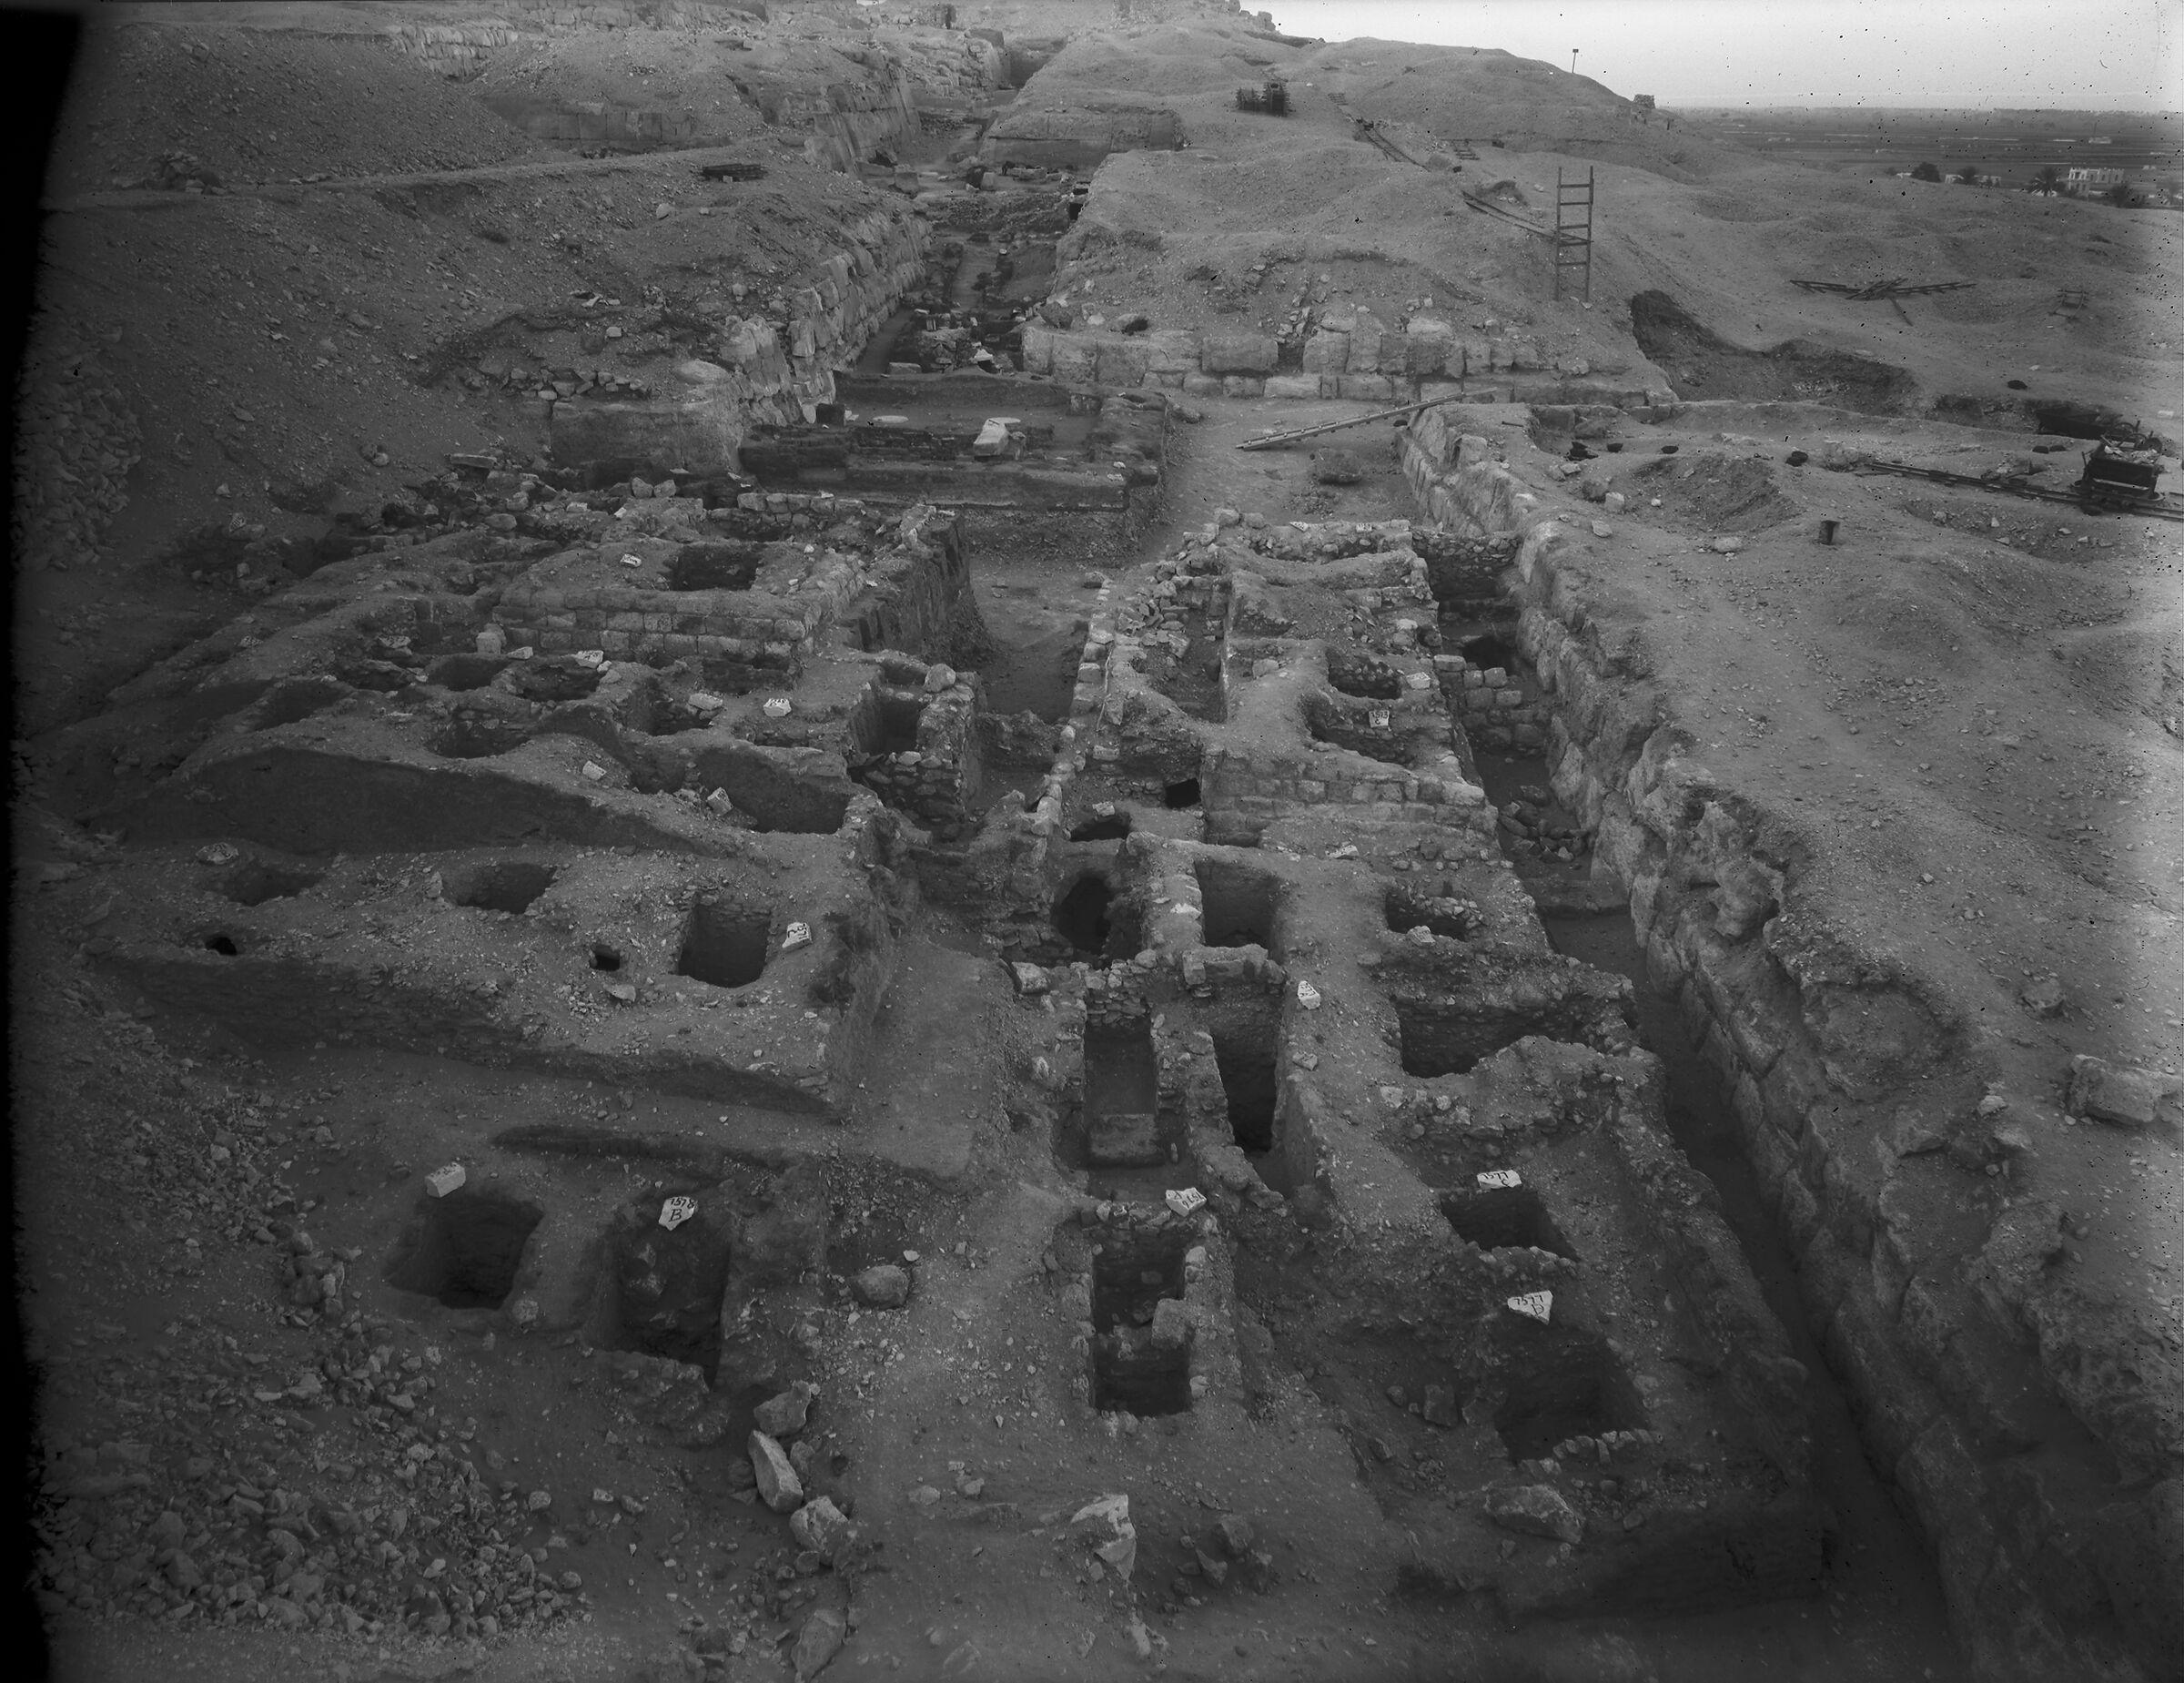 Eastern Cemetery: Site: Giza; View: G 7560, G 7690, G 7670, G 7563, G 7566, G 7567, G 7568, G 7569, G 7573, G 7571, G 7577, G 7578